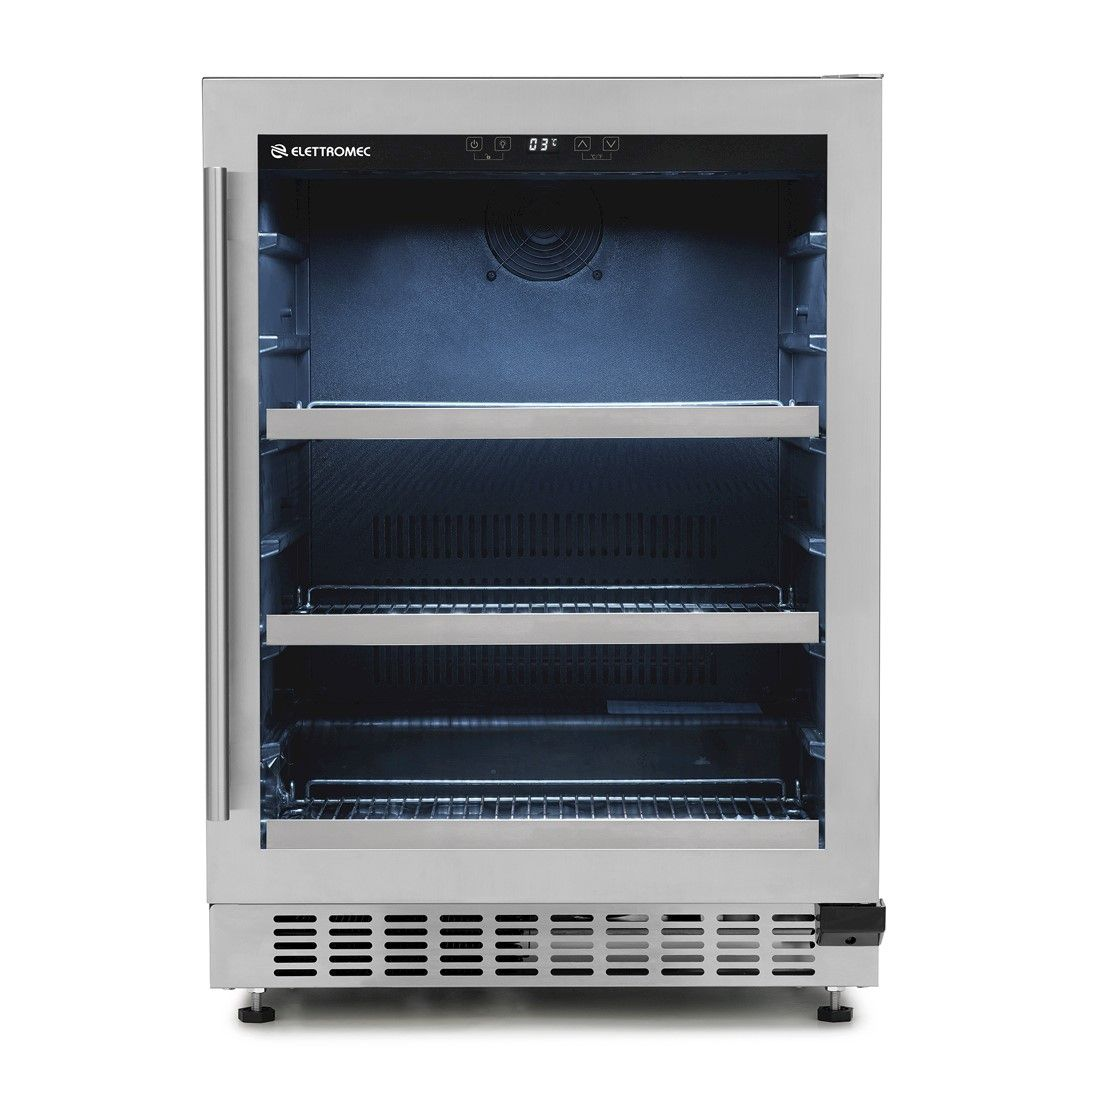 Frigobar Elettromec de Embutir 135 Litros Inox